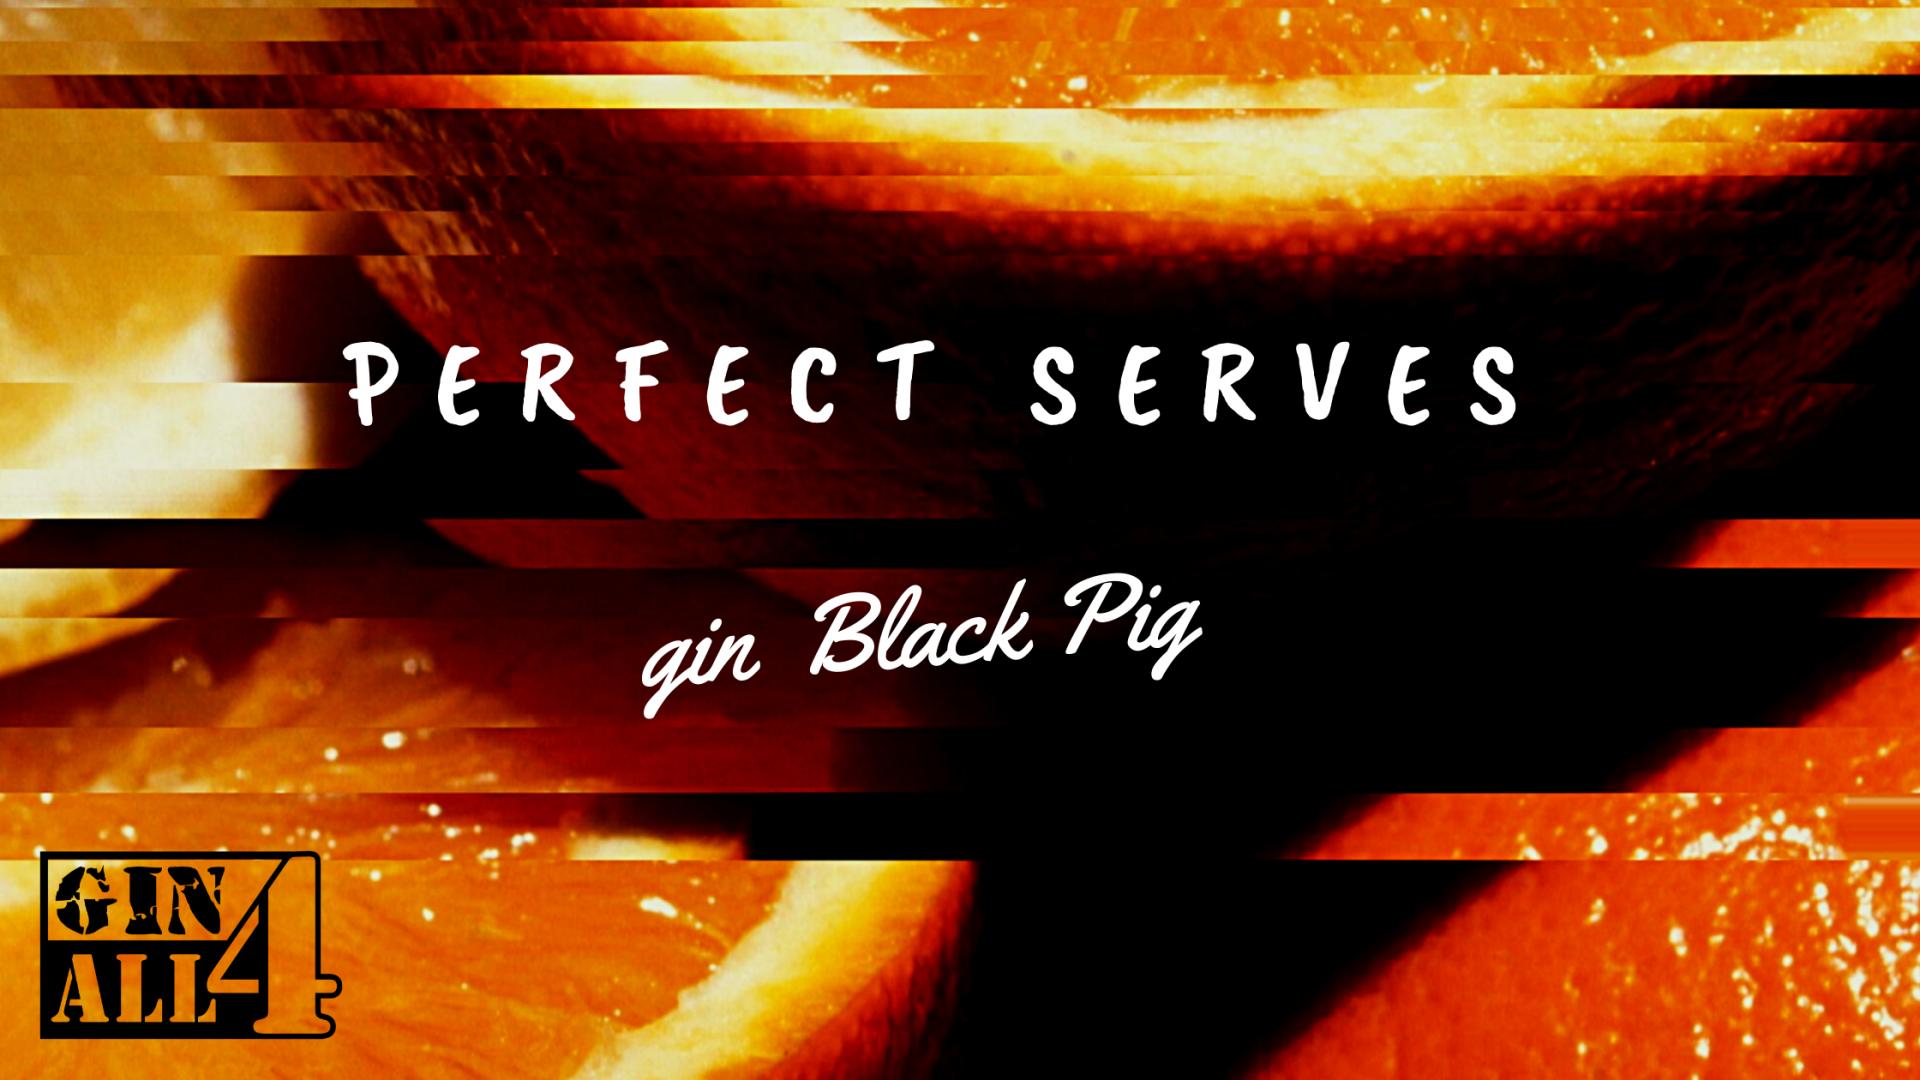 Perfect Serves - GIN BLACK PIG